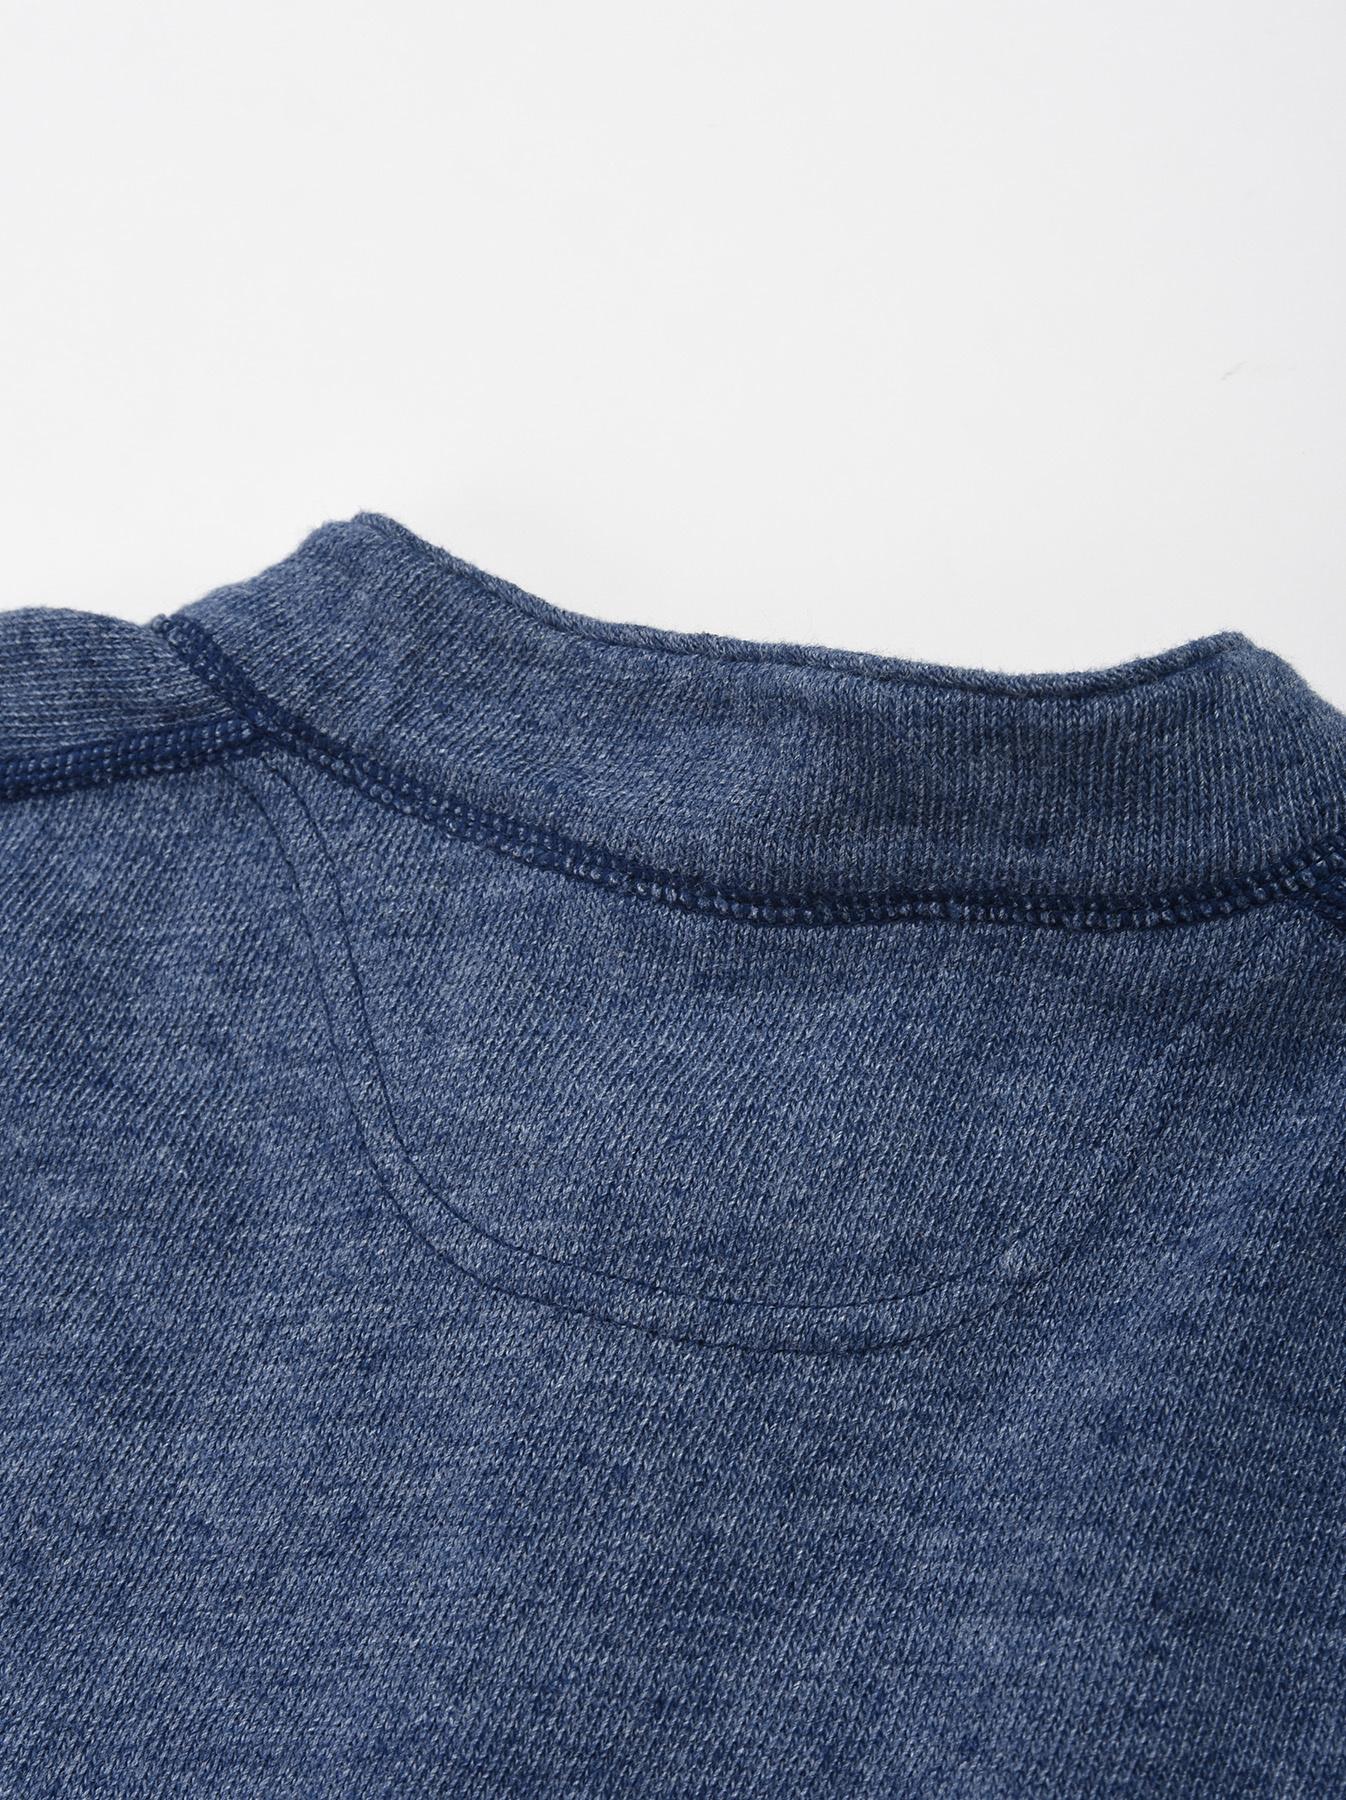 Low-gauge Tenjiku Long-sleeved Henley-9